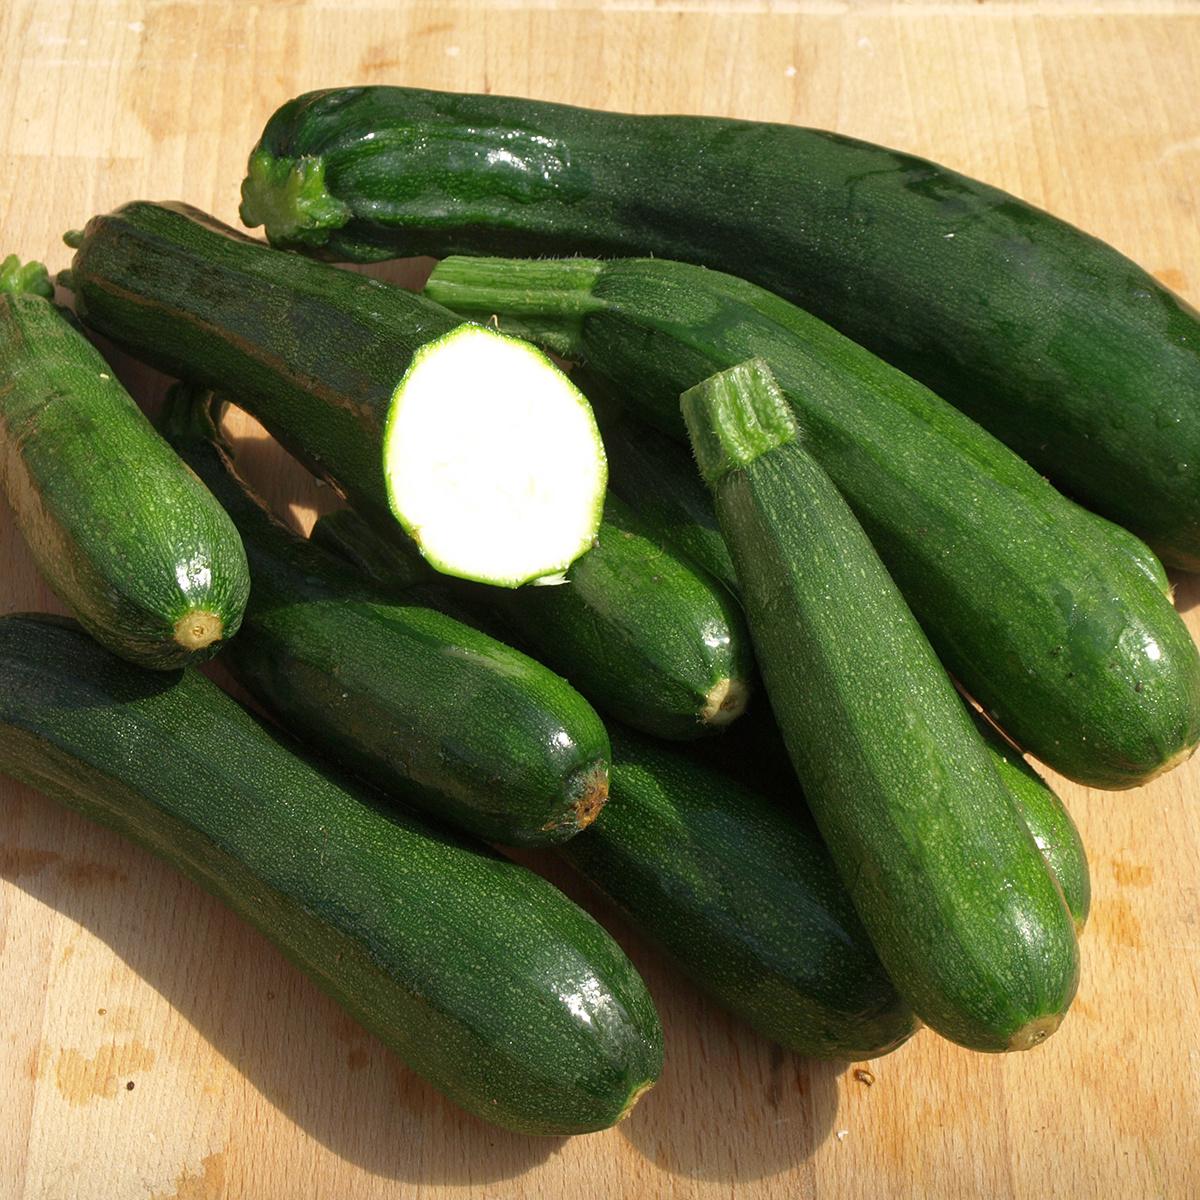 Saat & Gut BIO-Zucchini Black Beauty